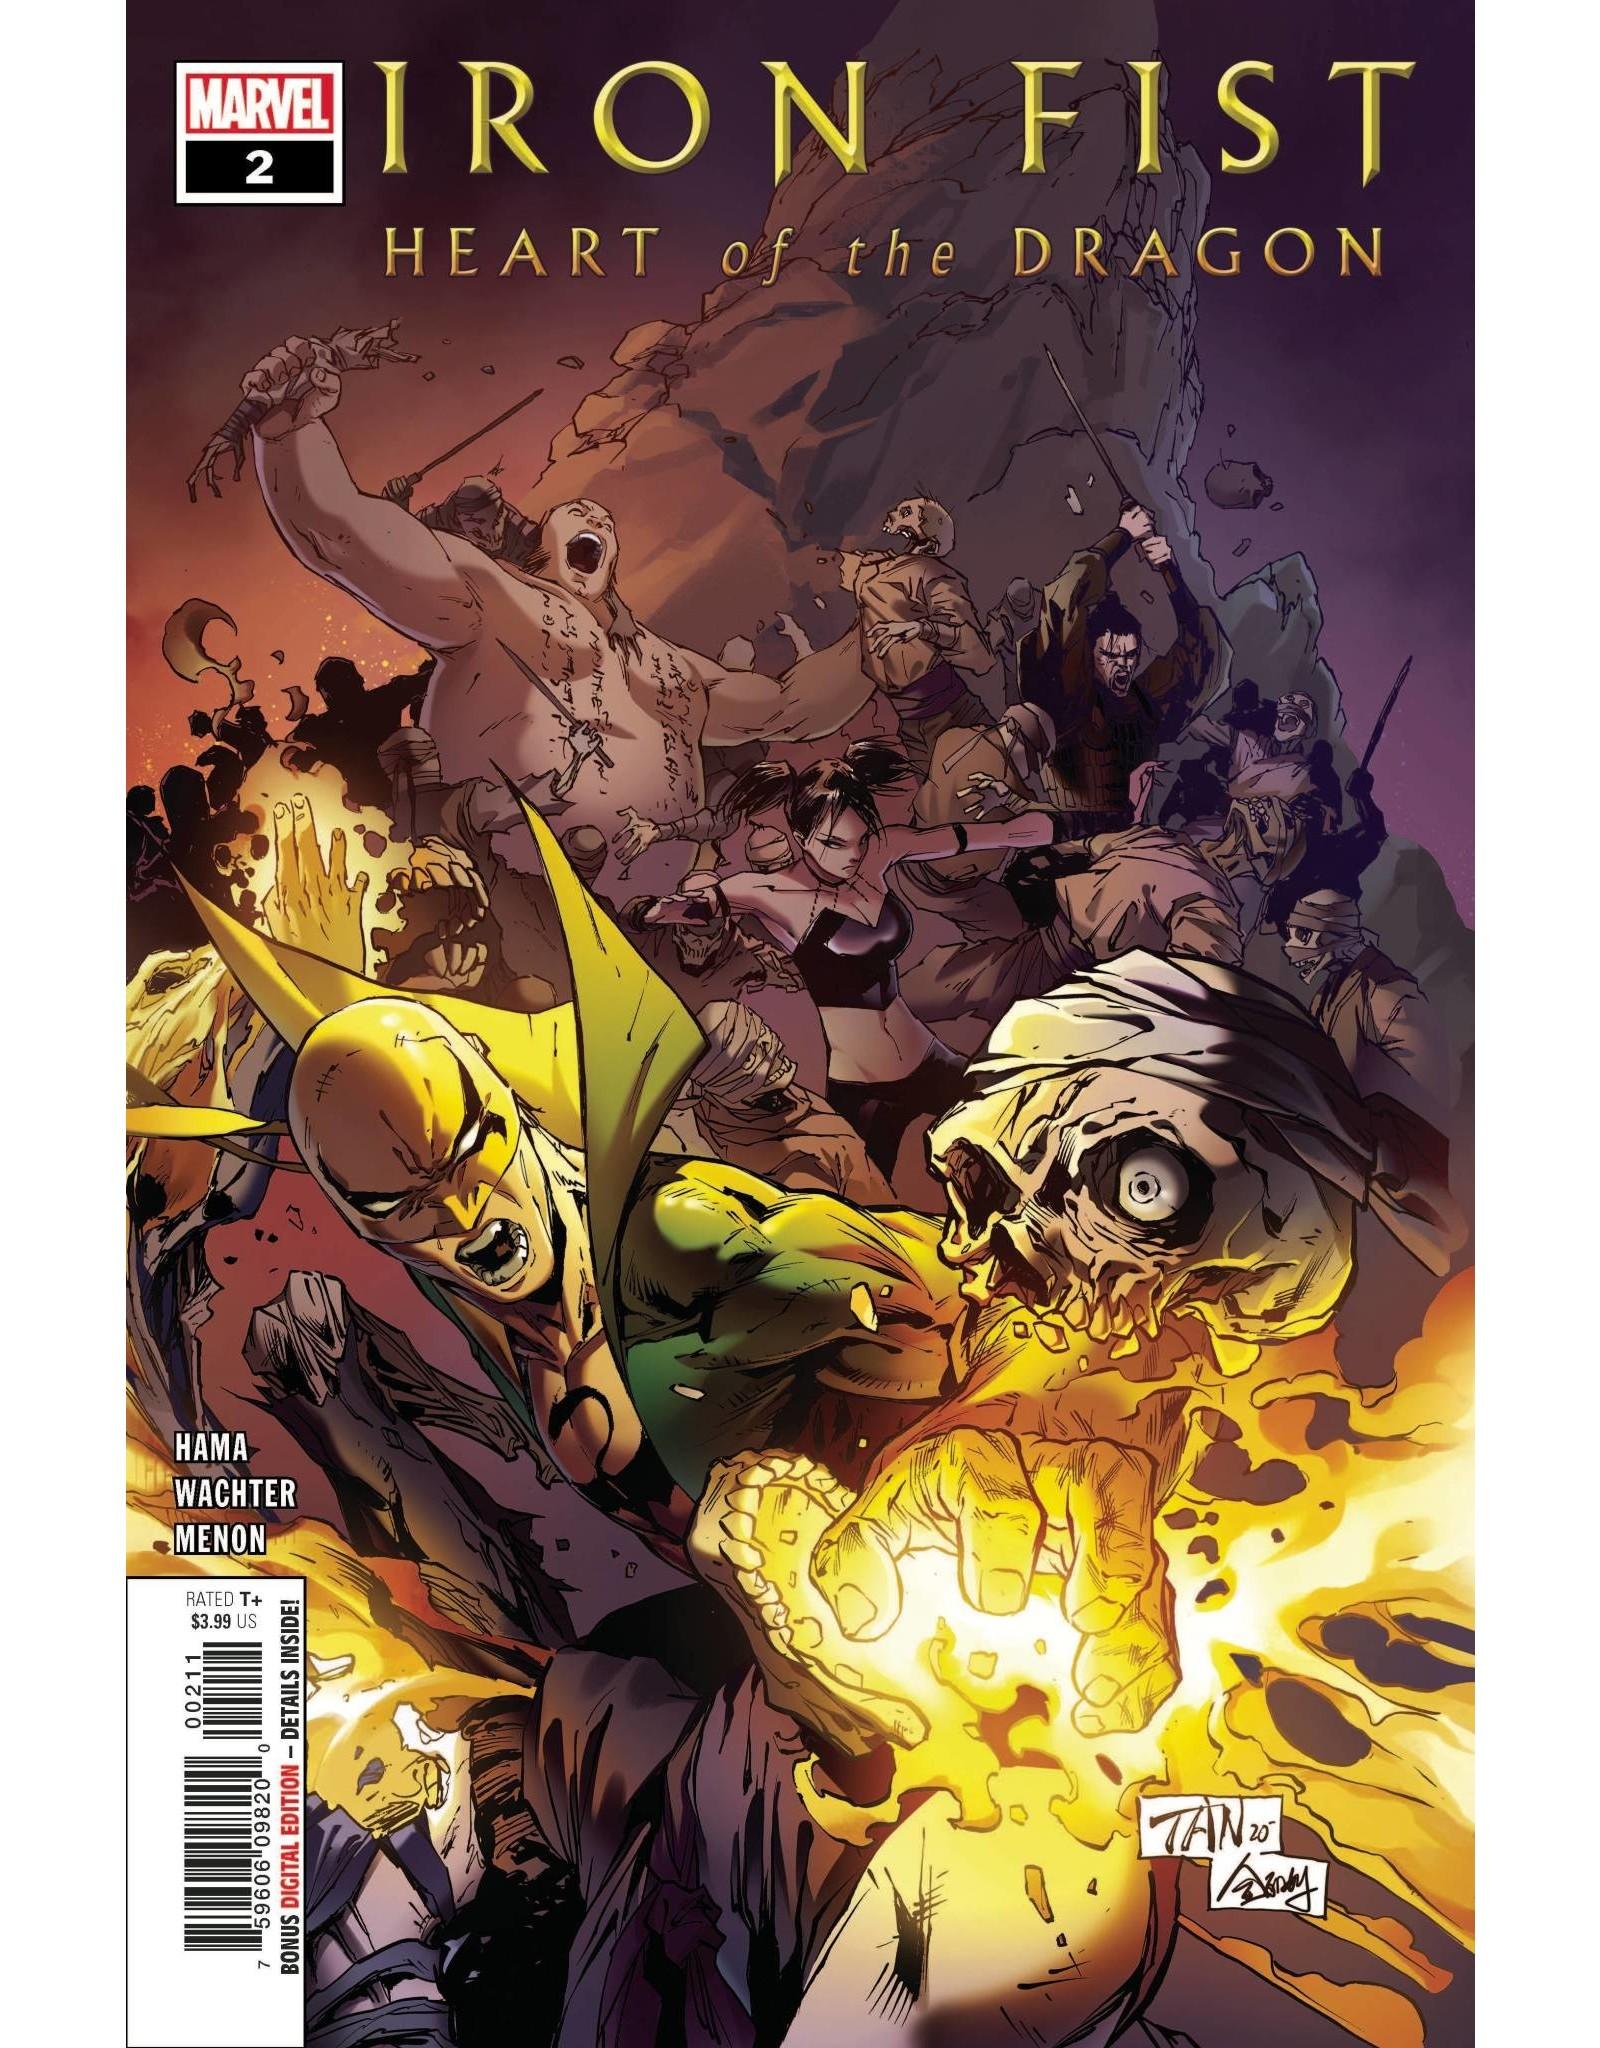 Marvel Comics IRON FIST HEART OF DRAGON #2 (OF 6)